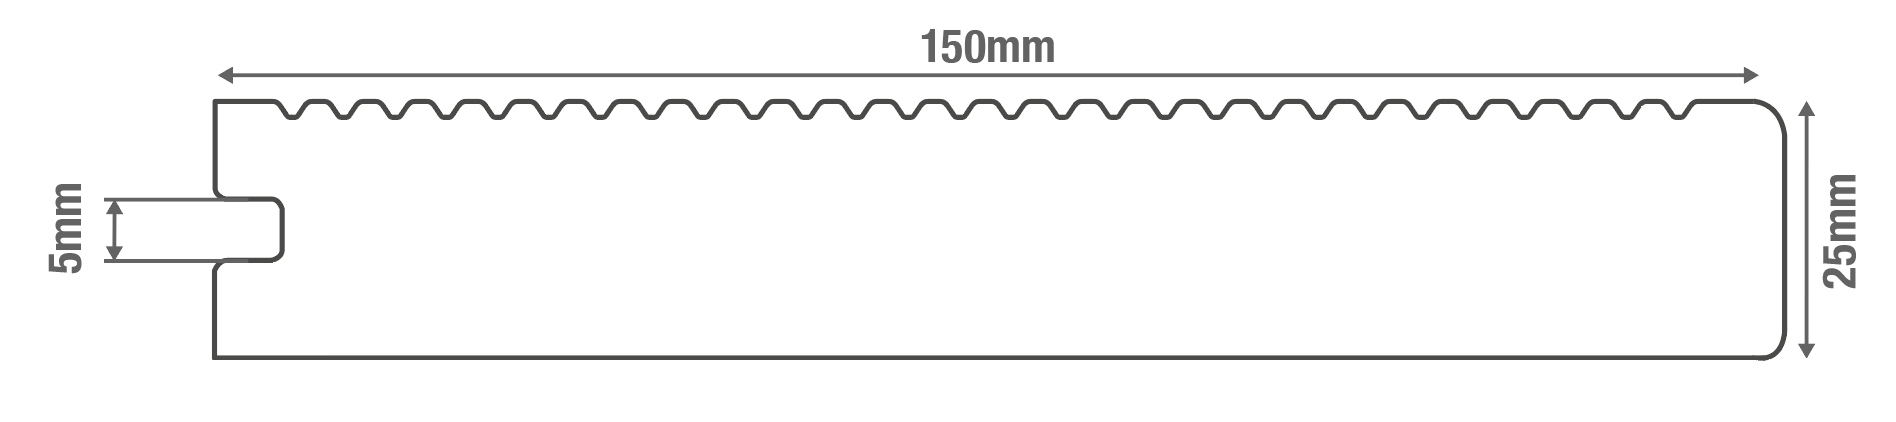 Solid Commercial Grade Bullnose Composite Decking Board Diagram